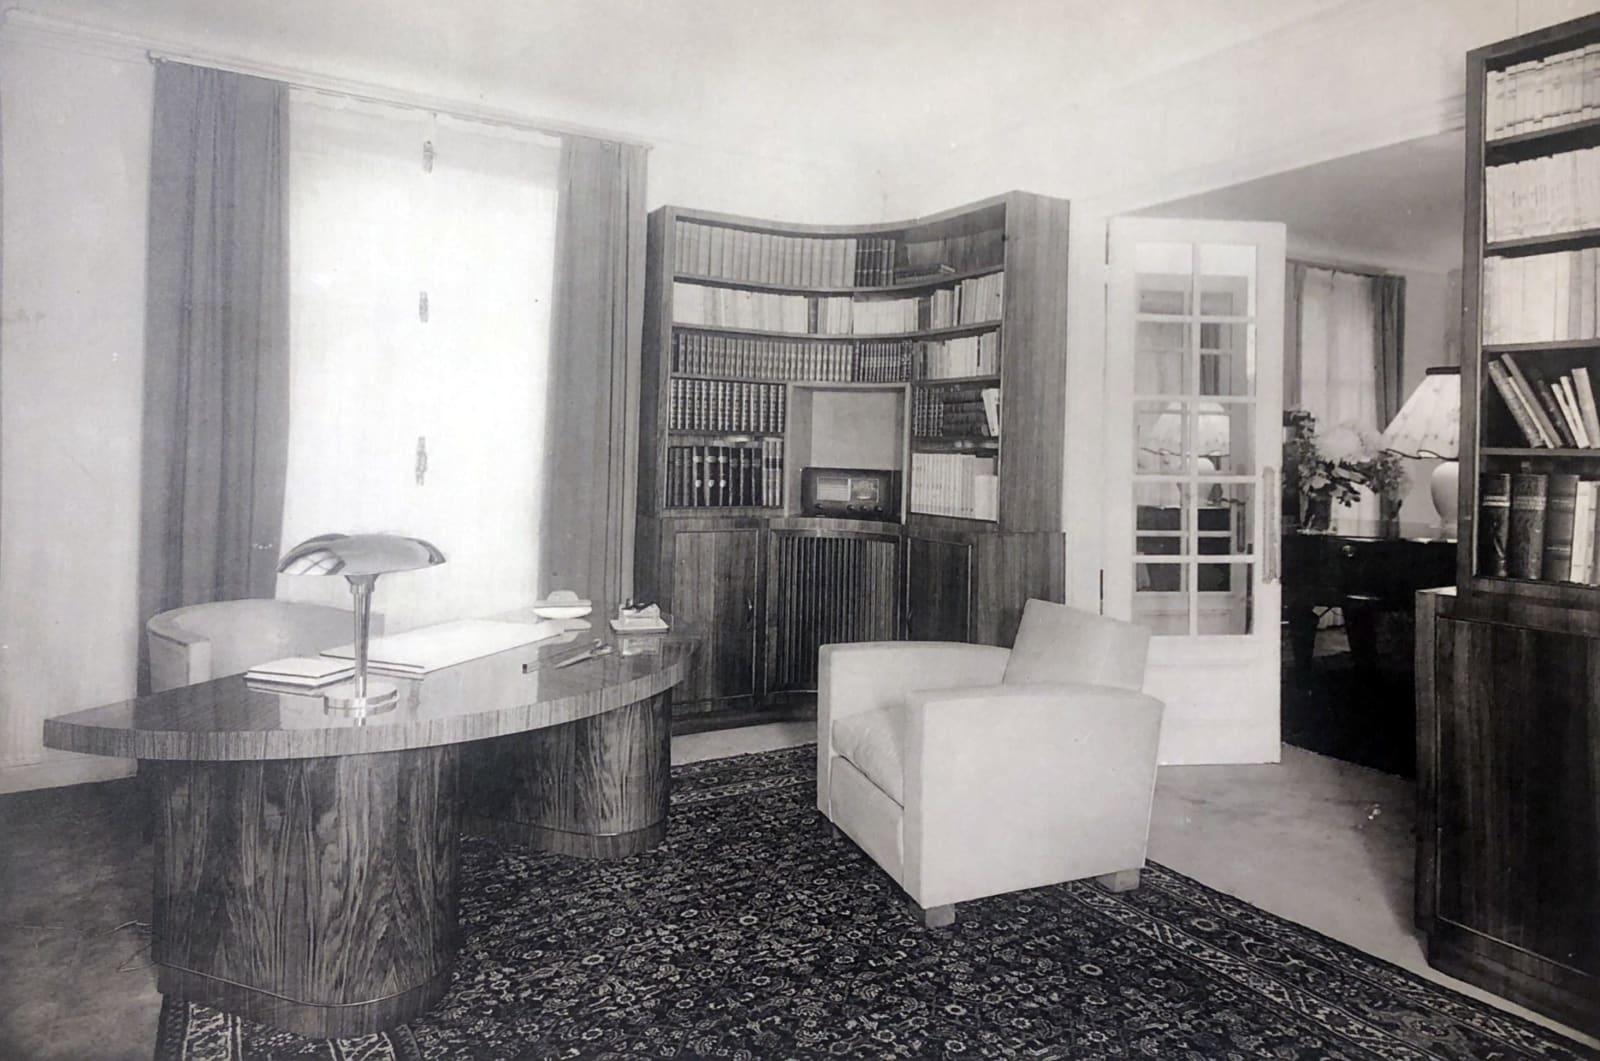 Maurice Rinck Art Deco Office Paris, 1932